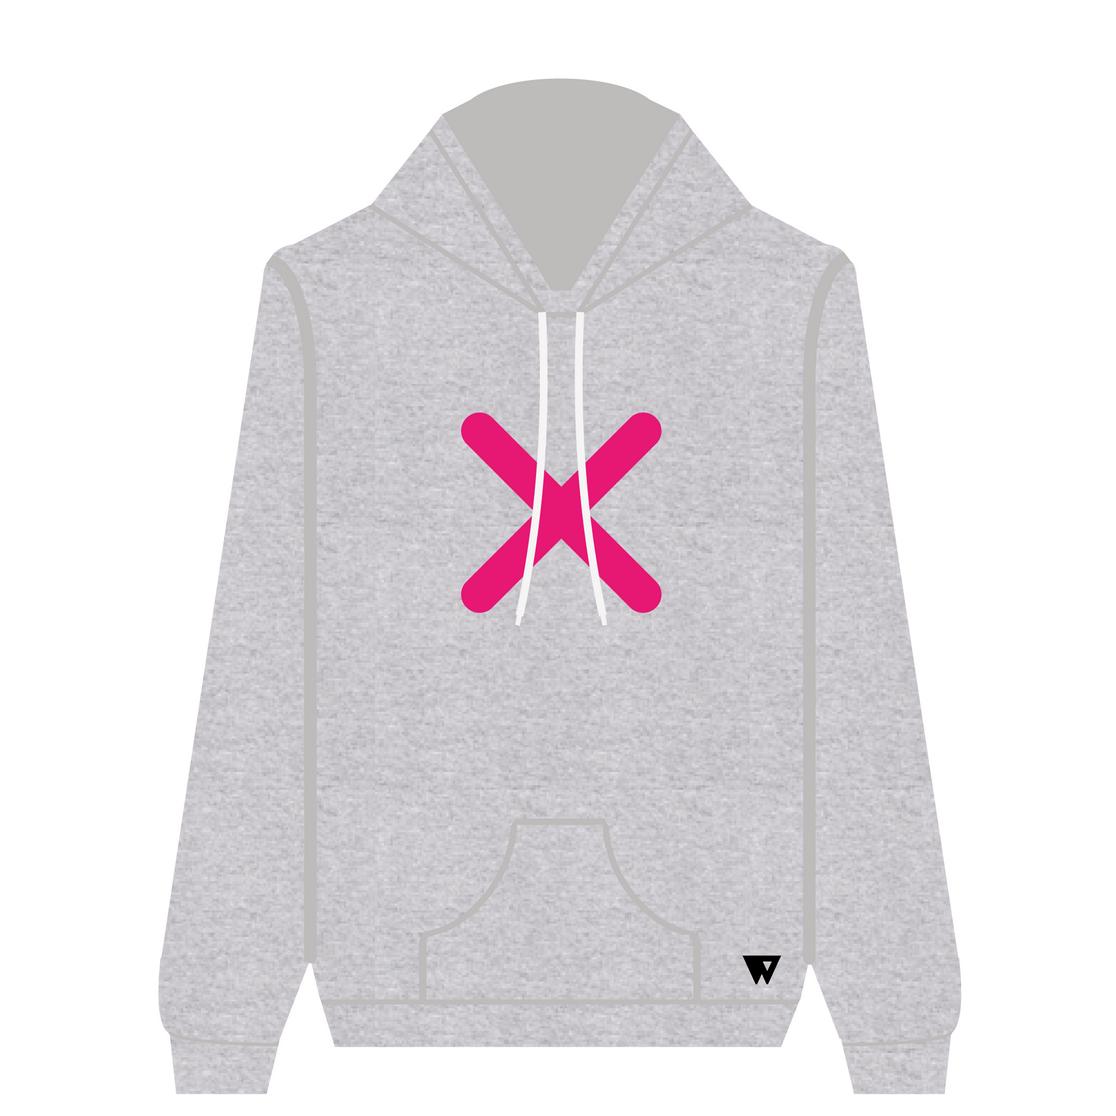 Hoodie Pink Cross   Wuzzee